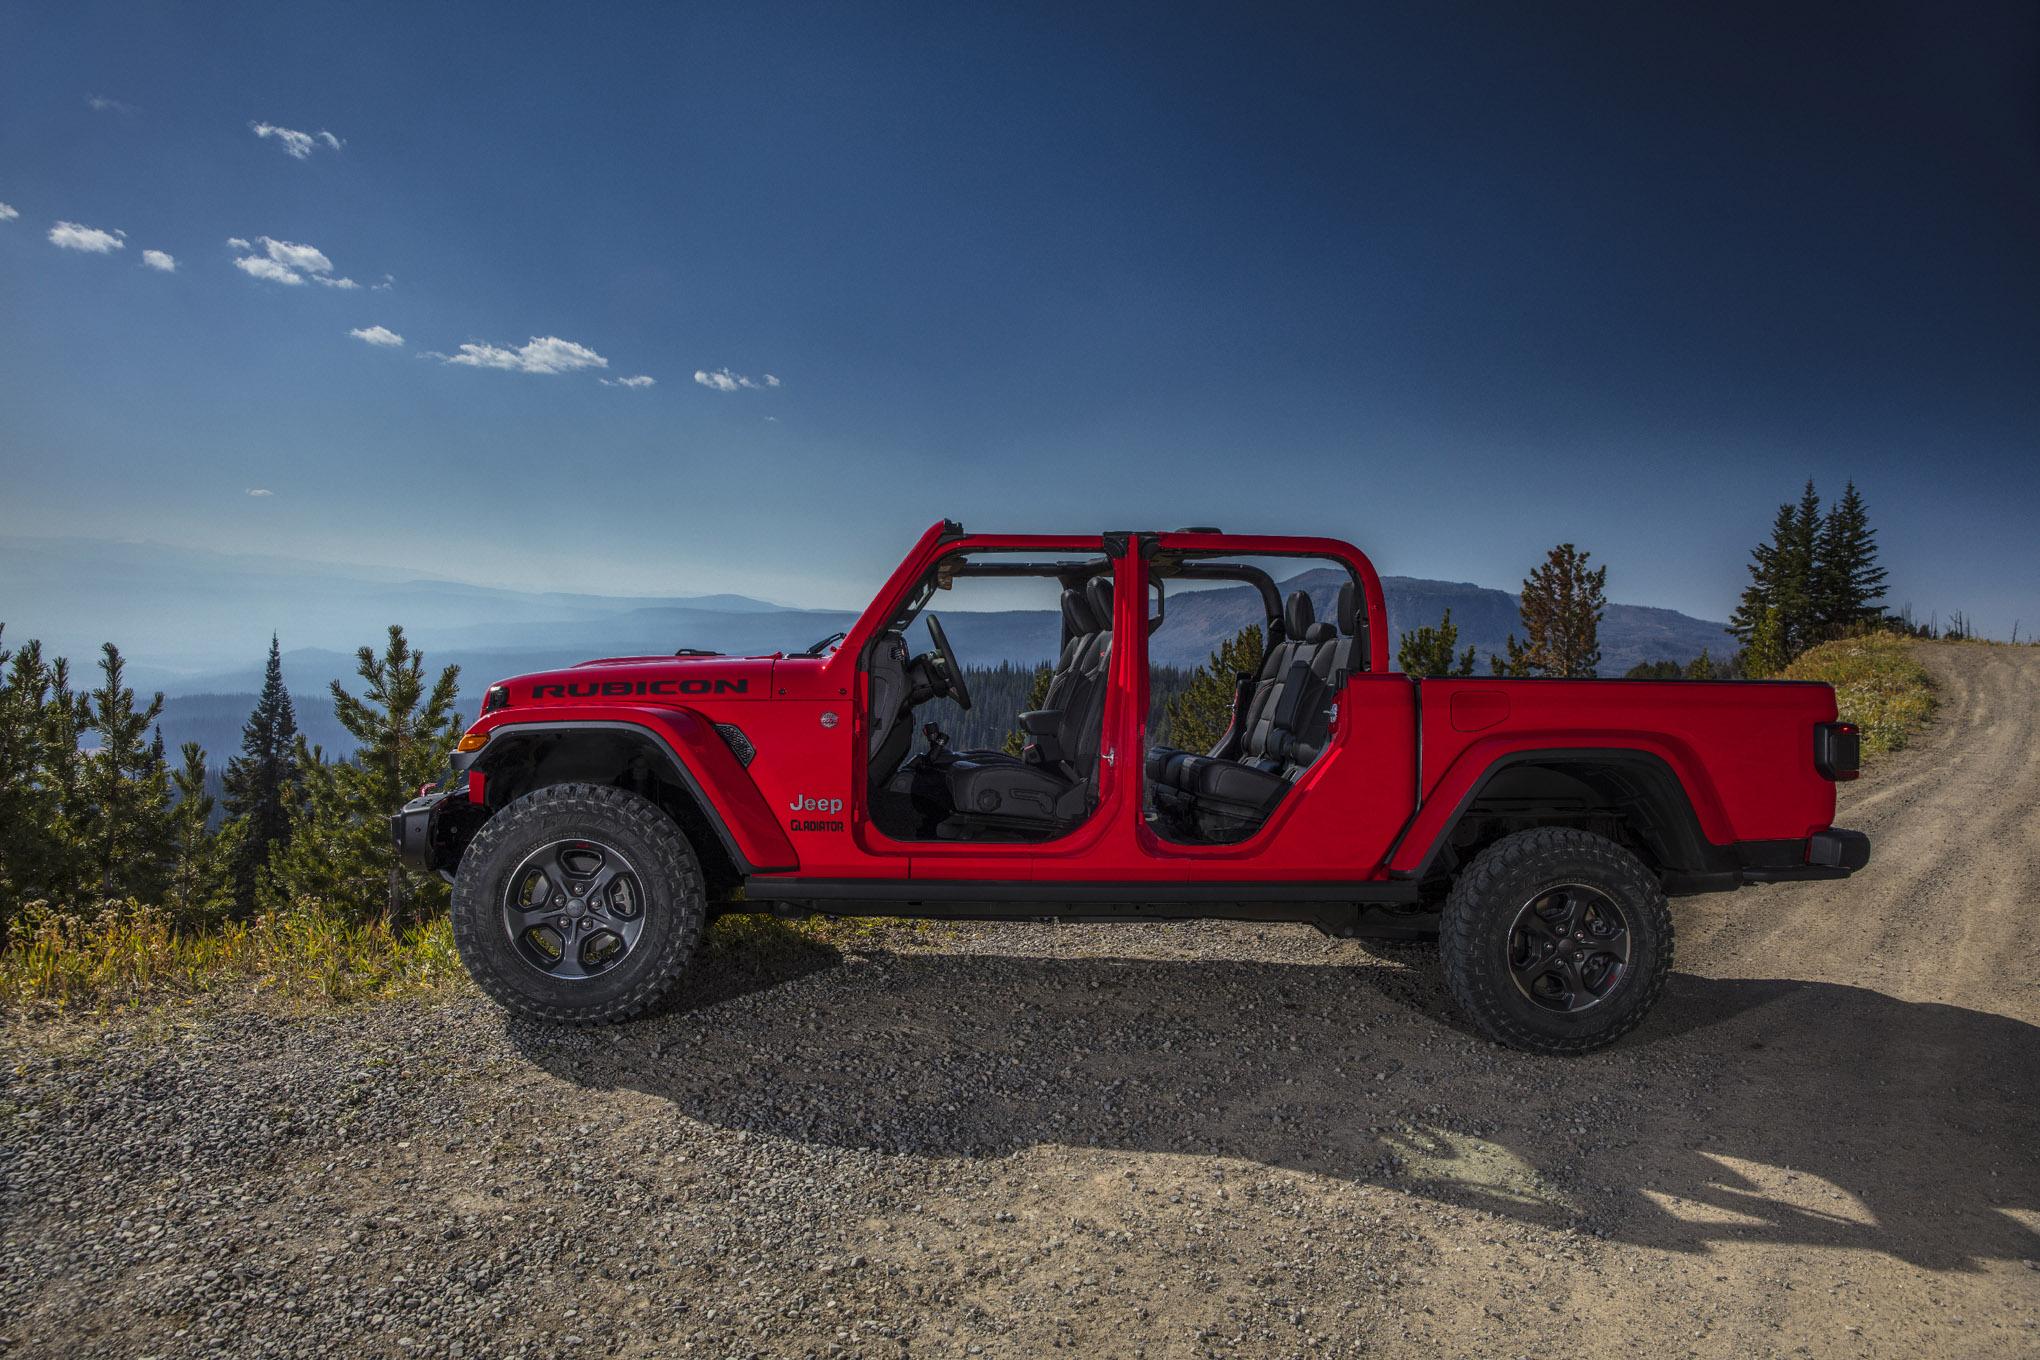 024 auto news four wheeler 2020 jeep gladiator side